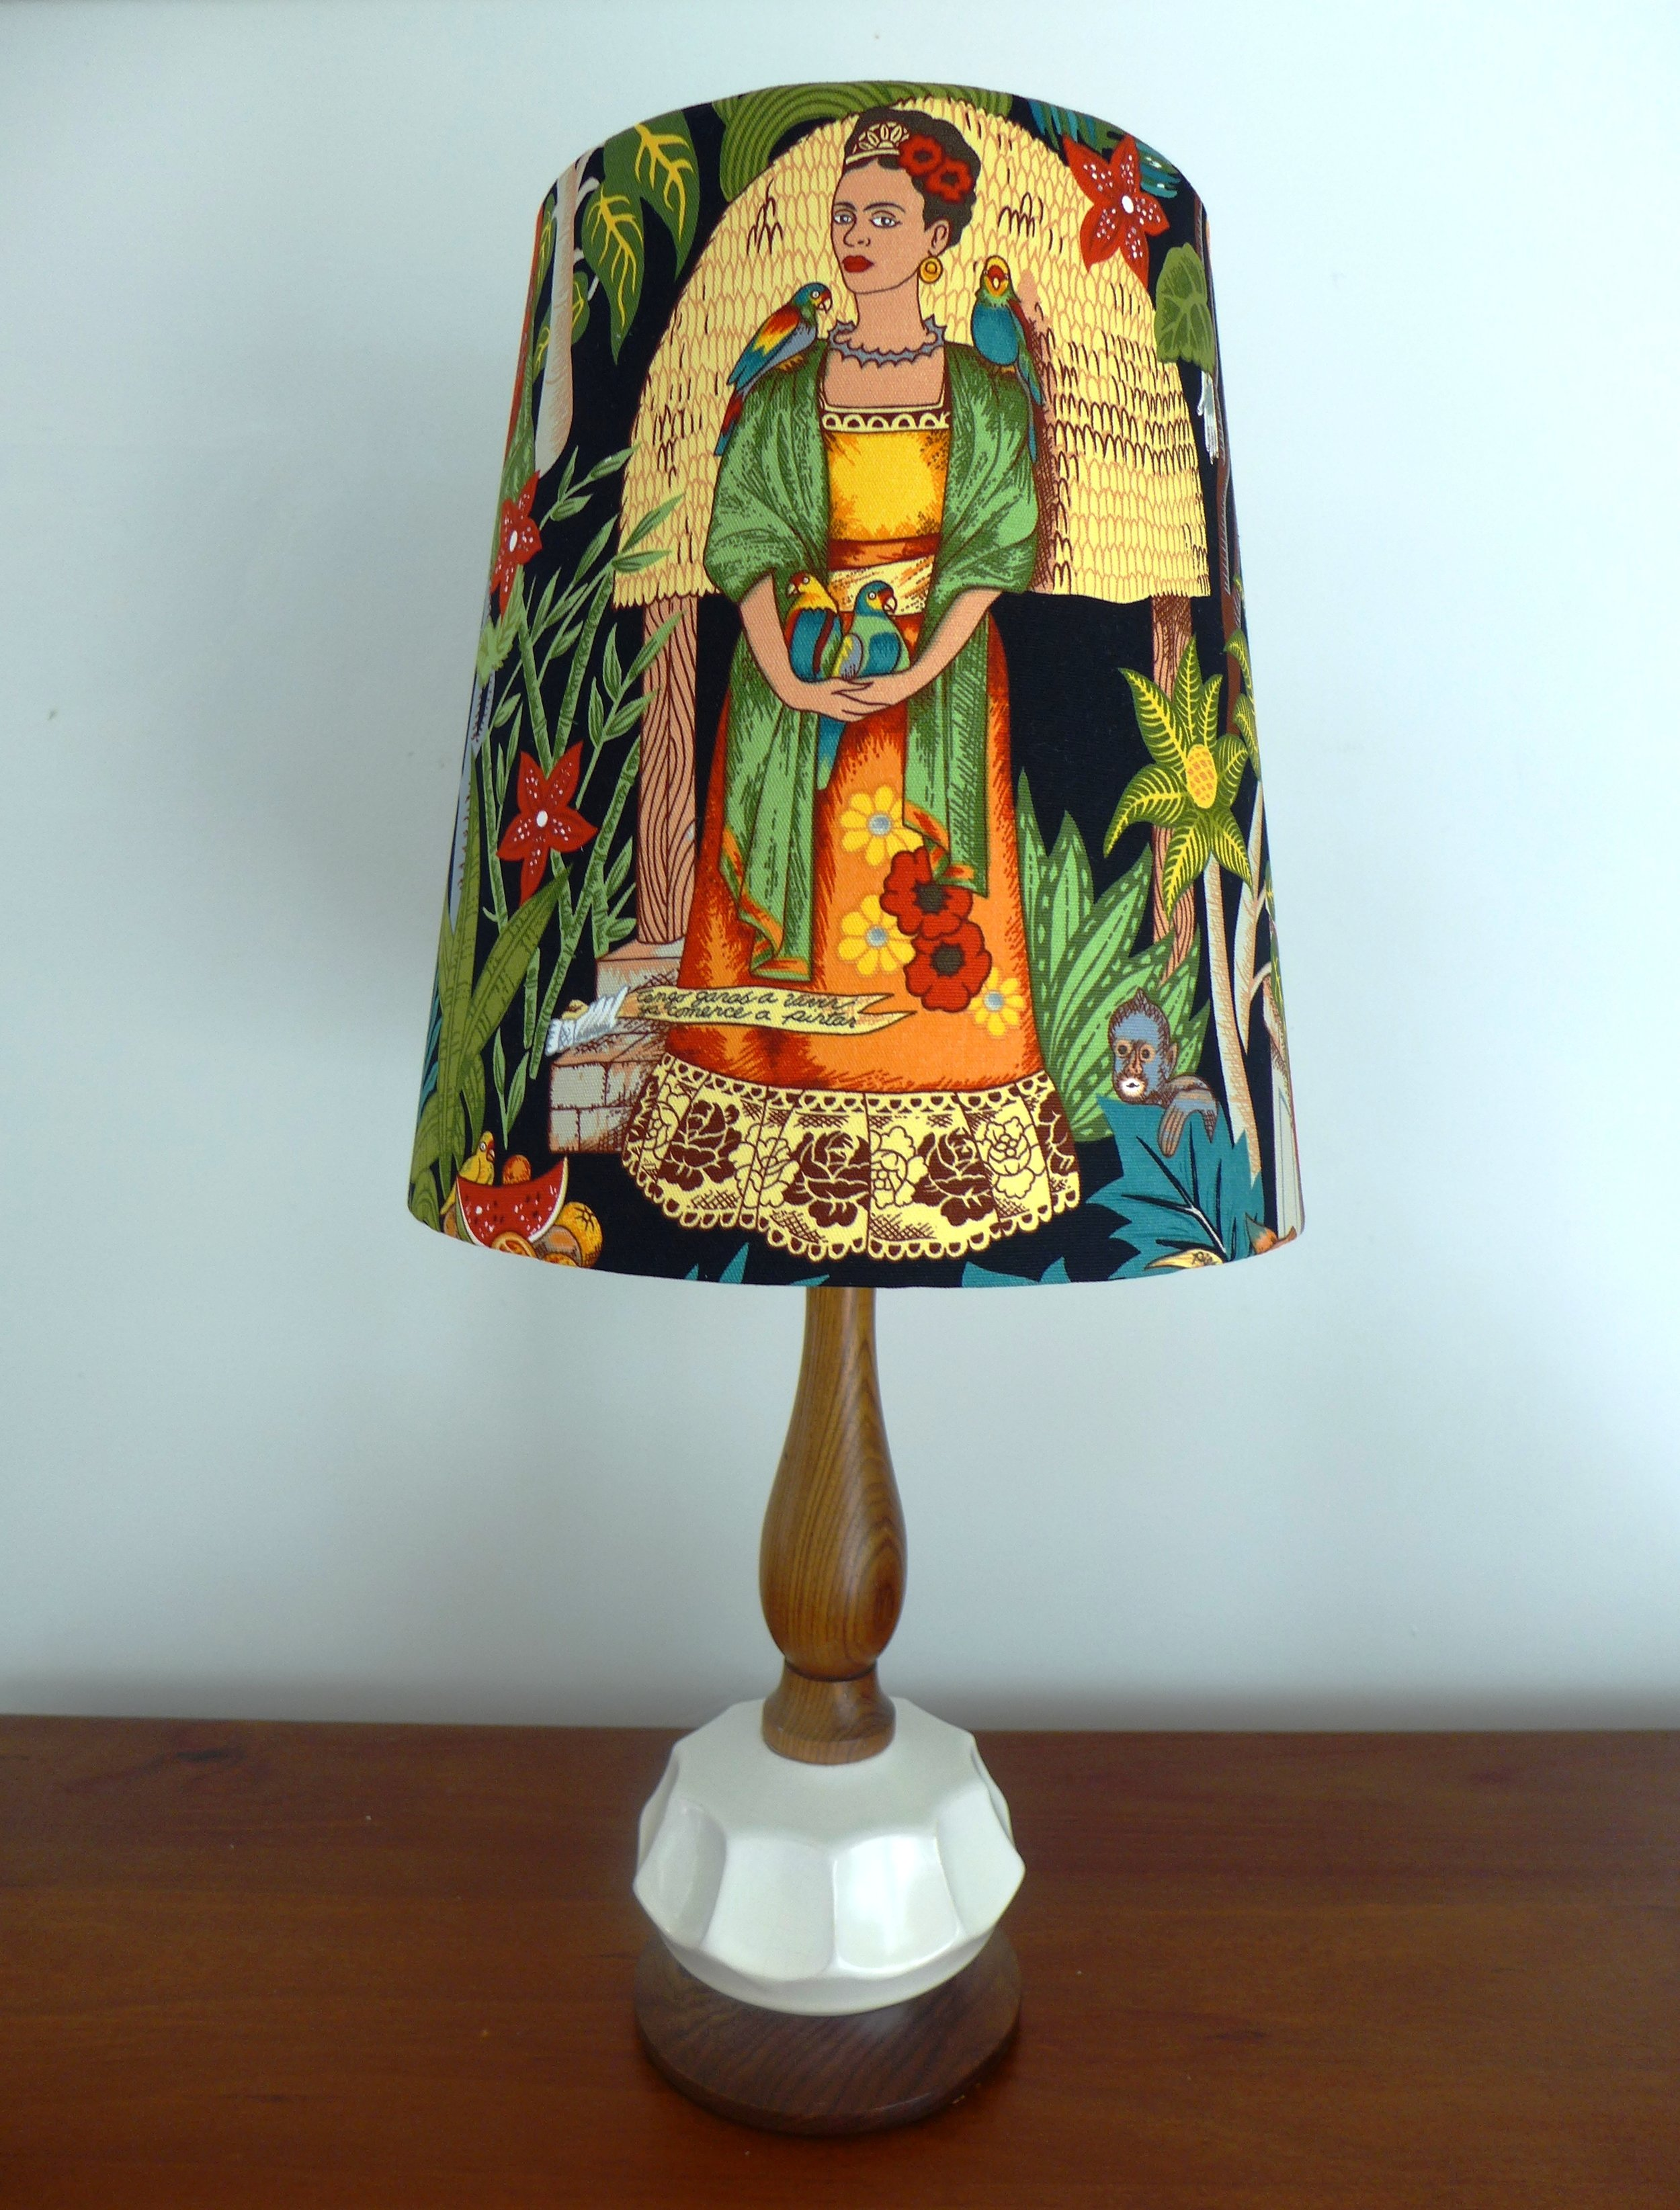 Frida Retro Lamp.JPG